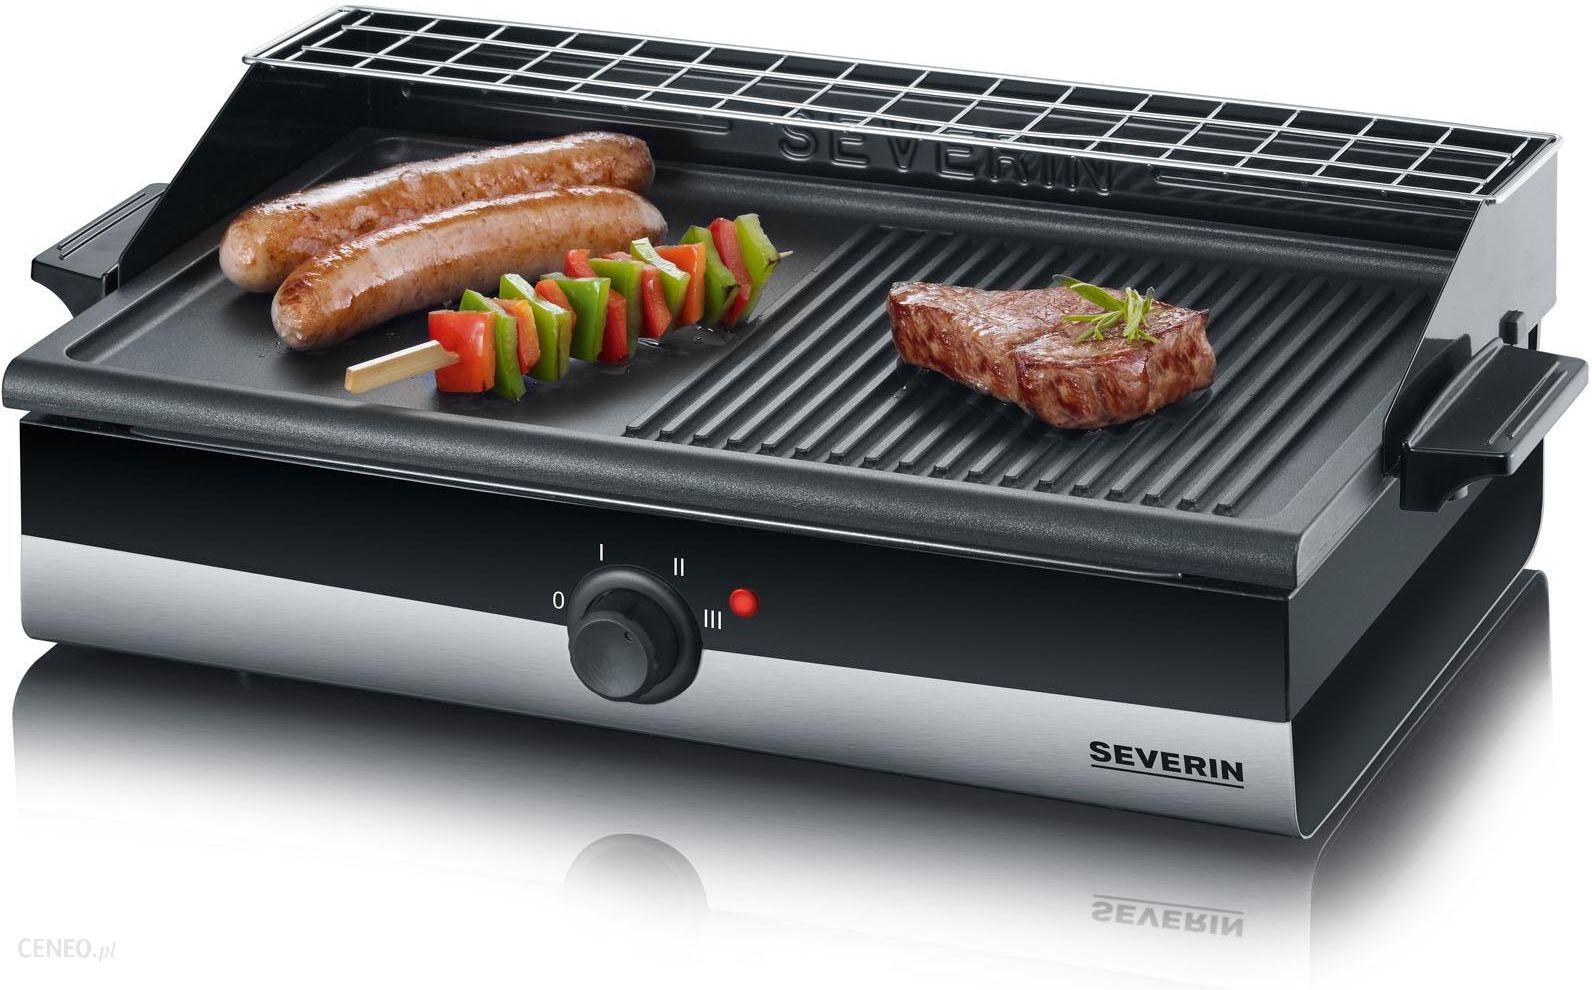 Severin Elektrogrill Pg 2790 : Grill severin images severin rg raclette partygrill